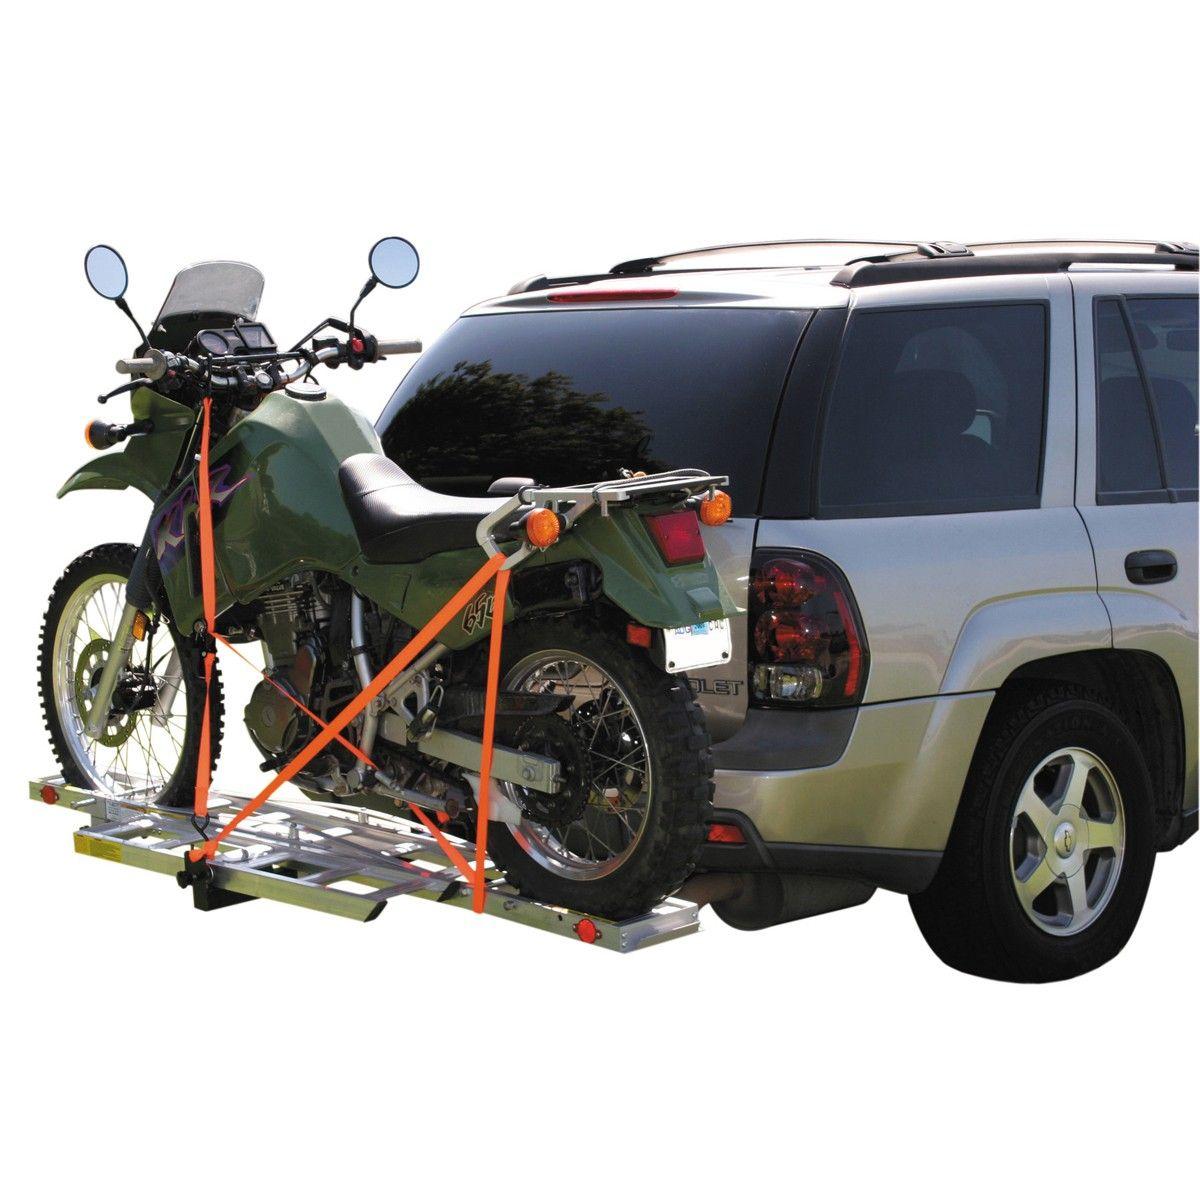 400 lb. ReceiverMount Motorcycle Carrier Moto bike